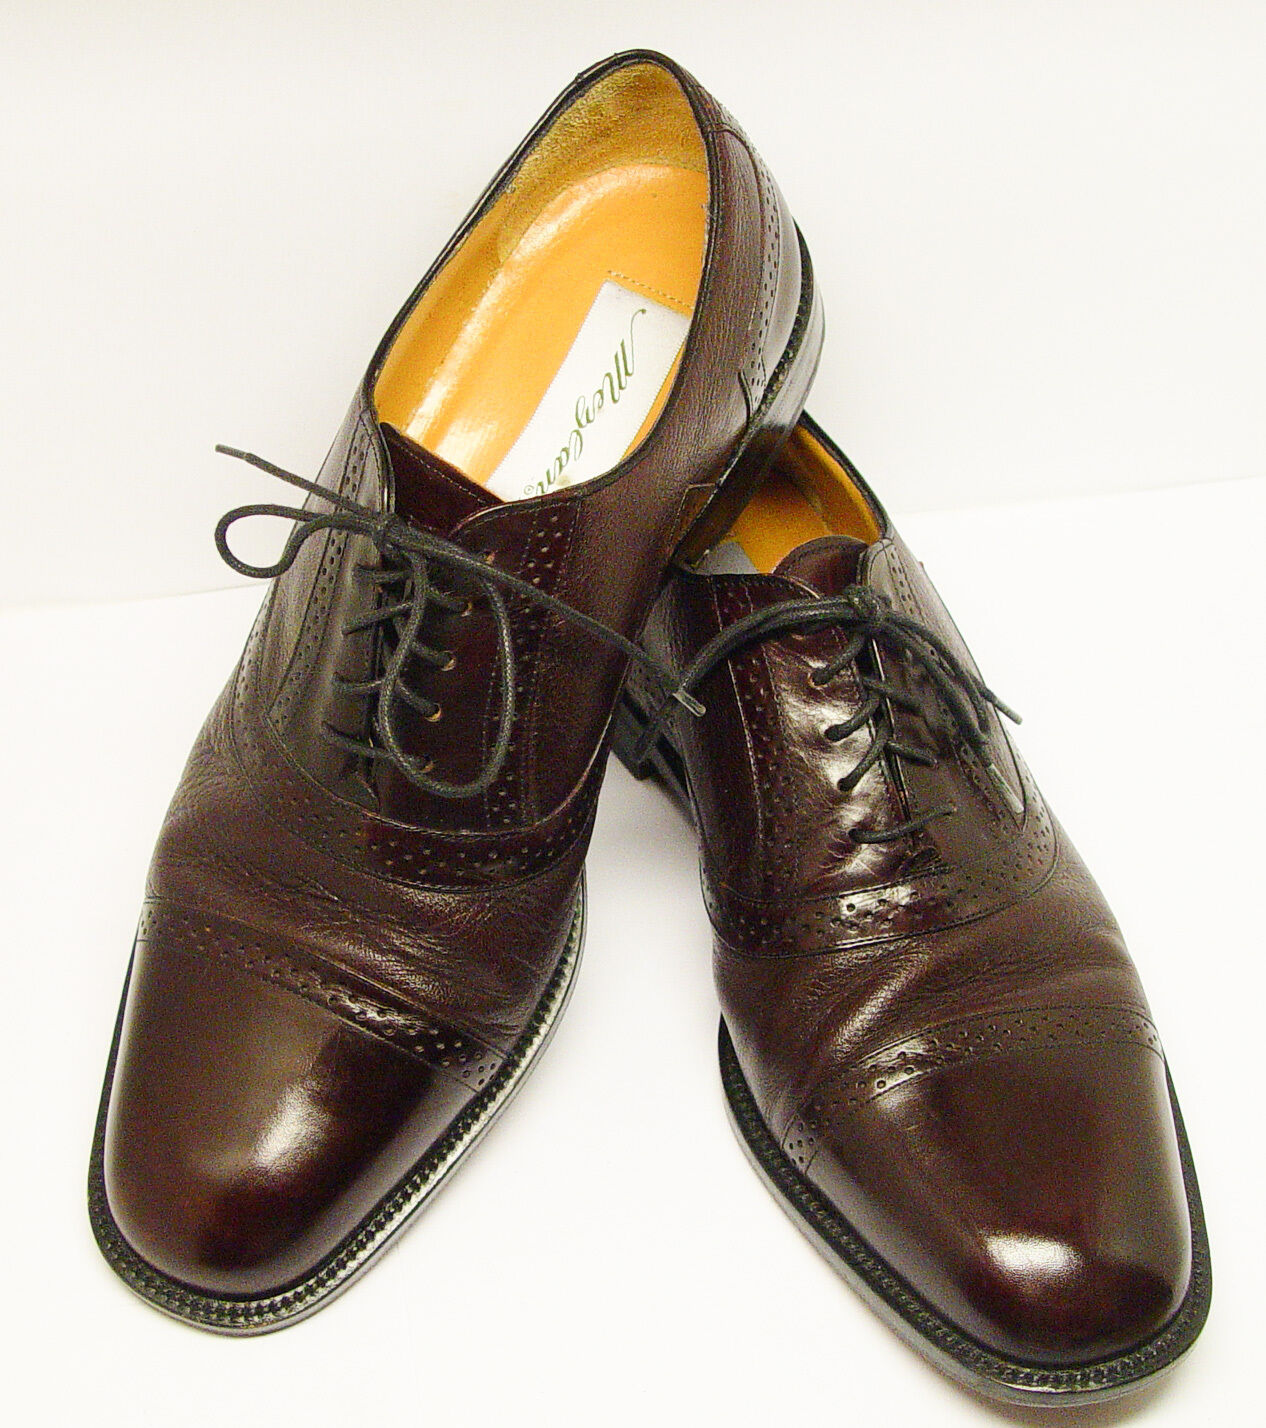 MEZLAN Marque Spain Made Leather 10M Dark Burgundy Brown Oxfords PRISTINE COND.